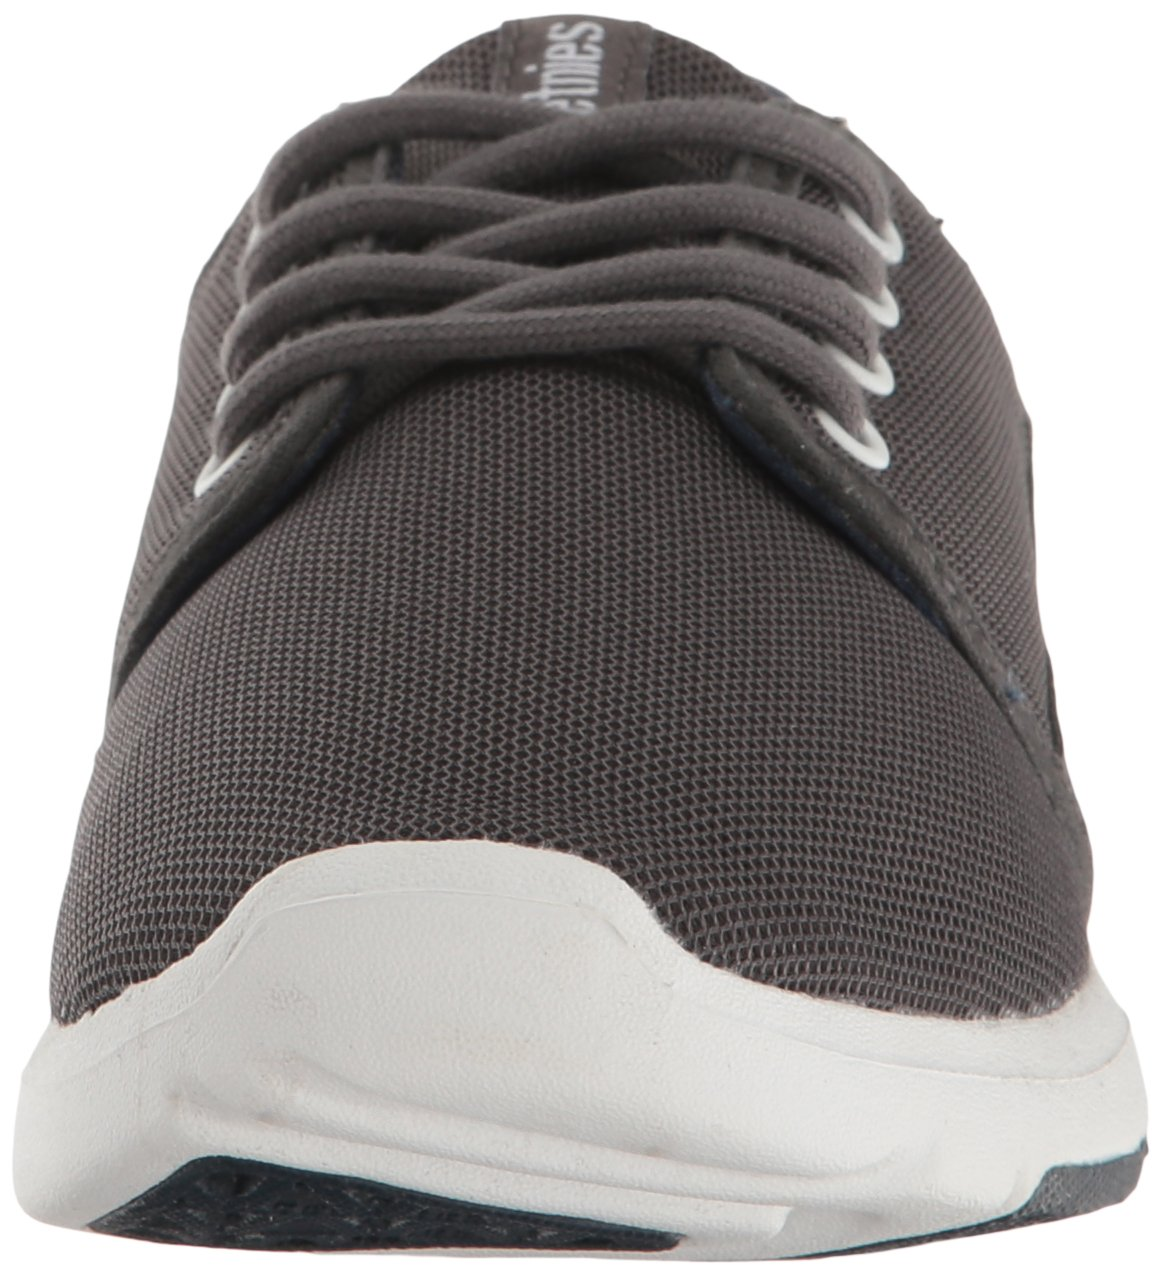 Etnies Womens B(M) Scout Sneaker B01M60TPVD 7.5 B(M) Womens US|Grey/Navy 4ea139